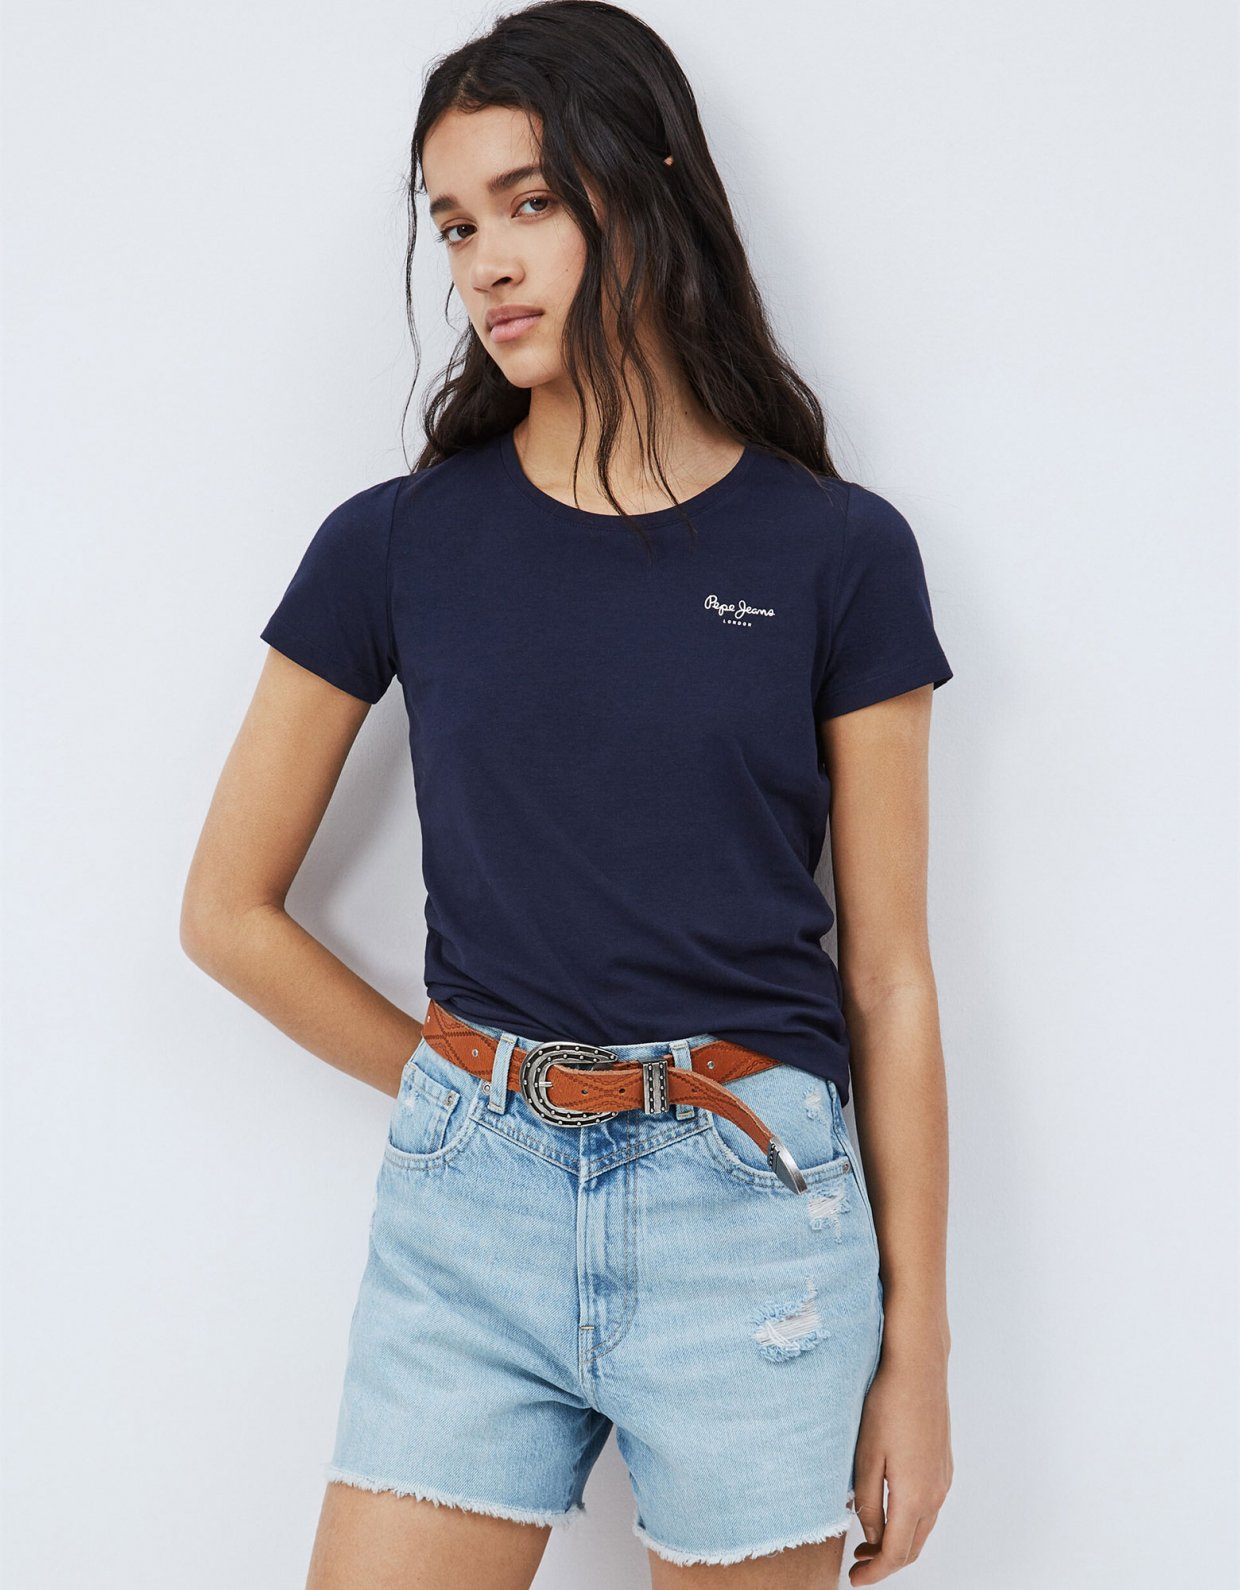 Pepe Jeans Bellrose basic t-shirt thames